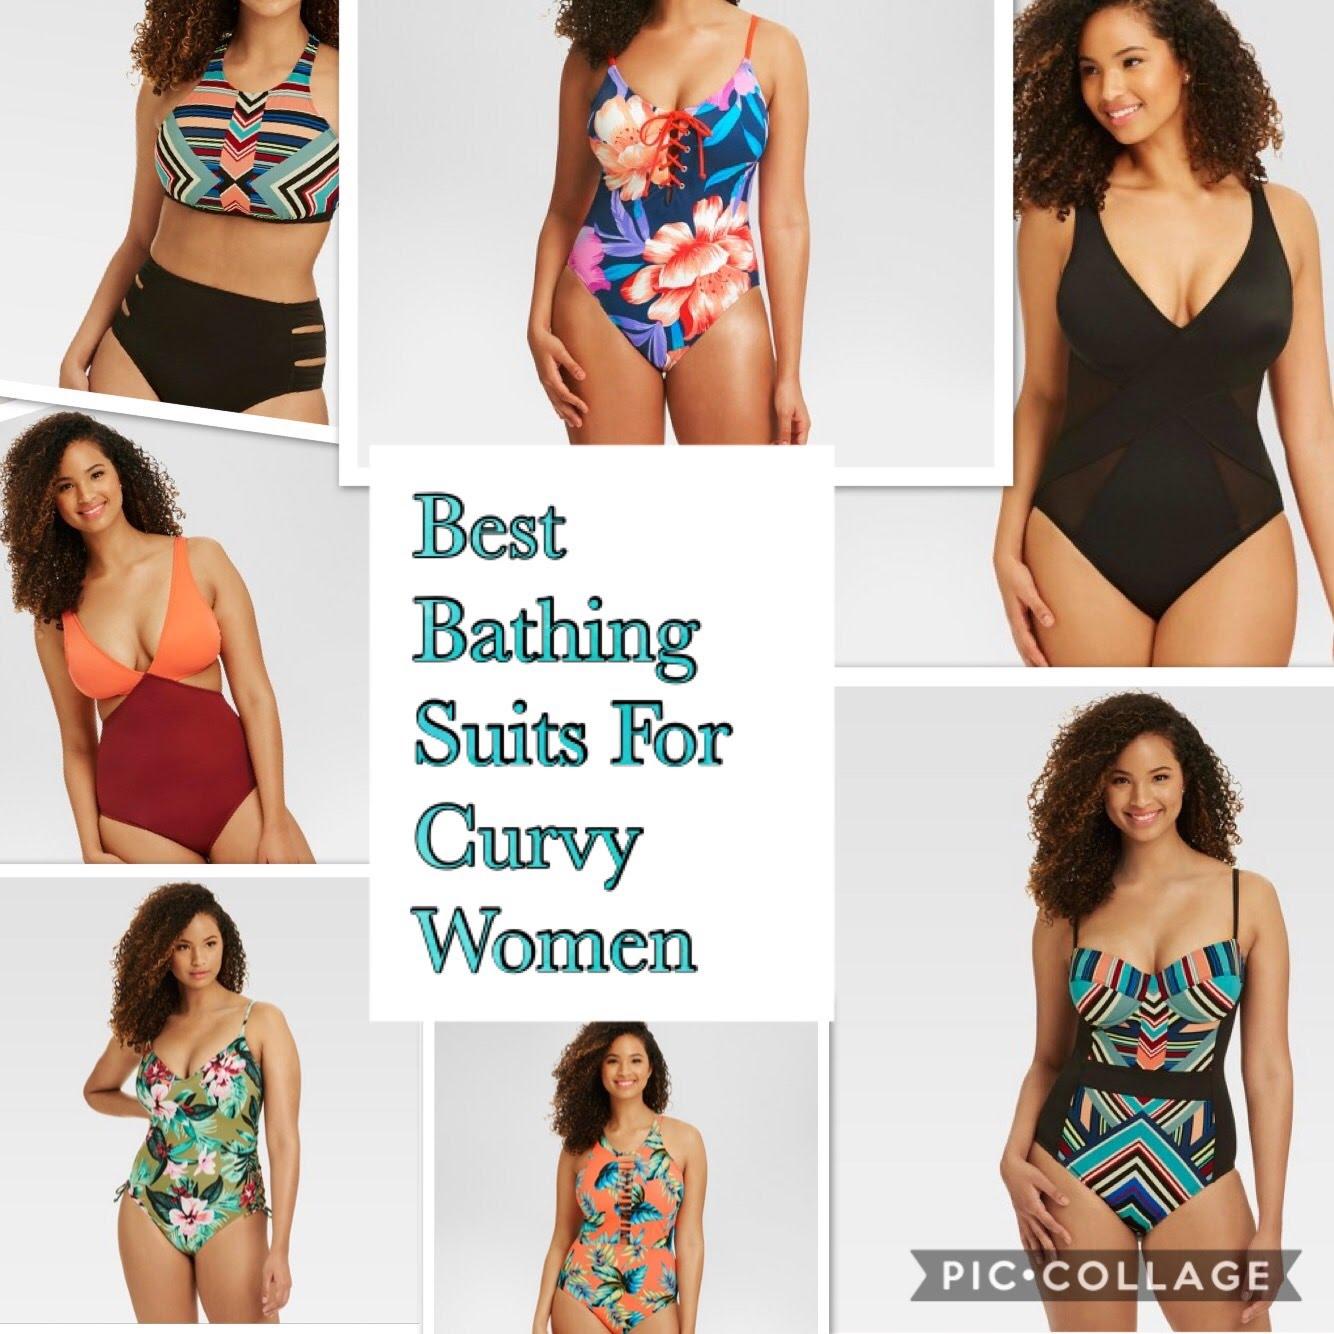 51fedbccd98 Best Bathing Suits For Curvy Women — Miri Makes It Happen